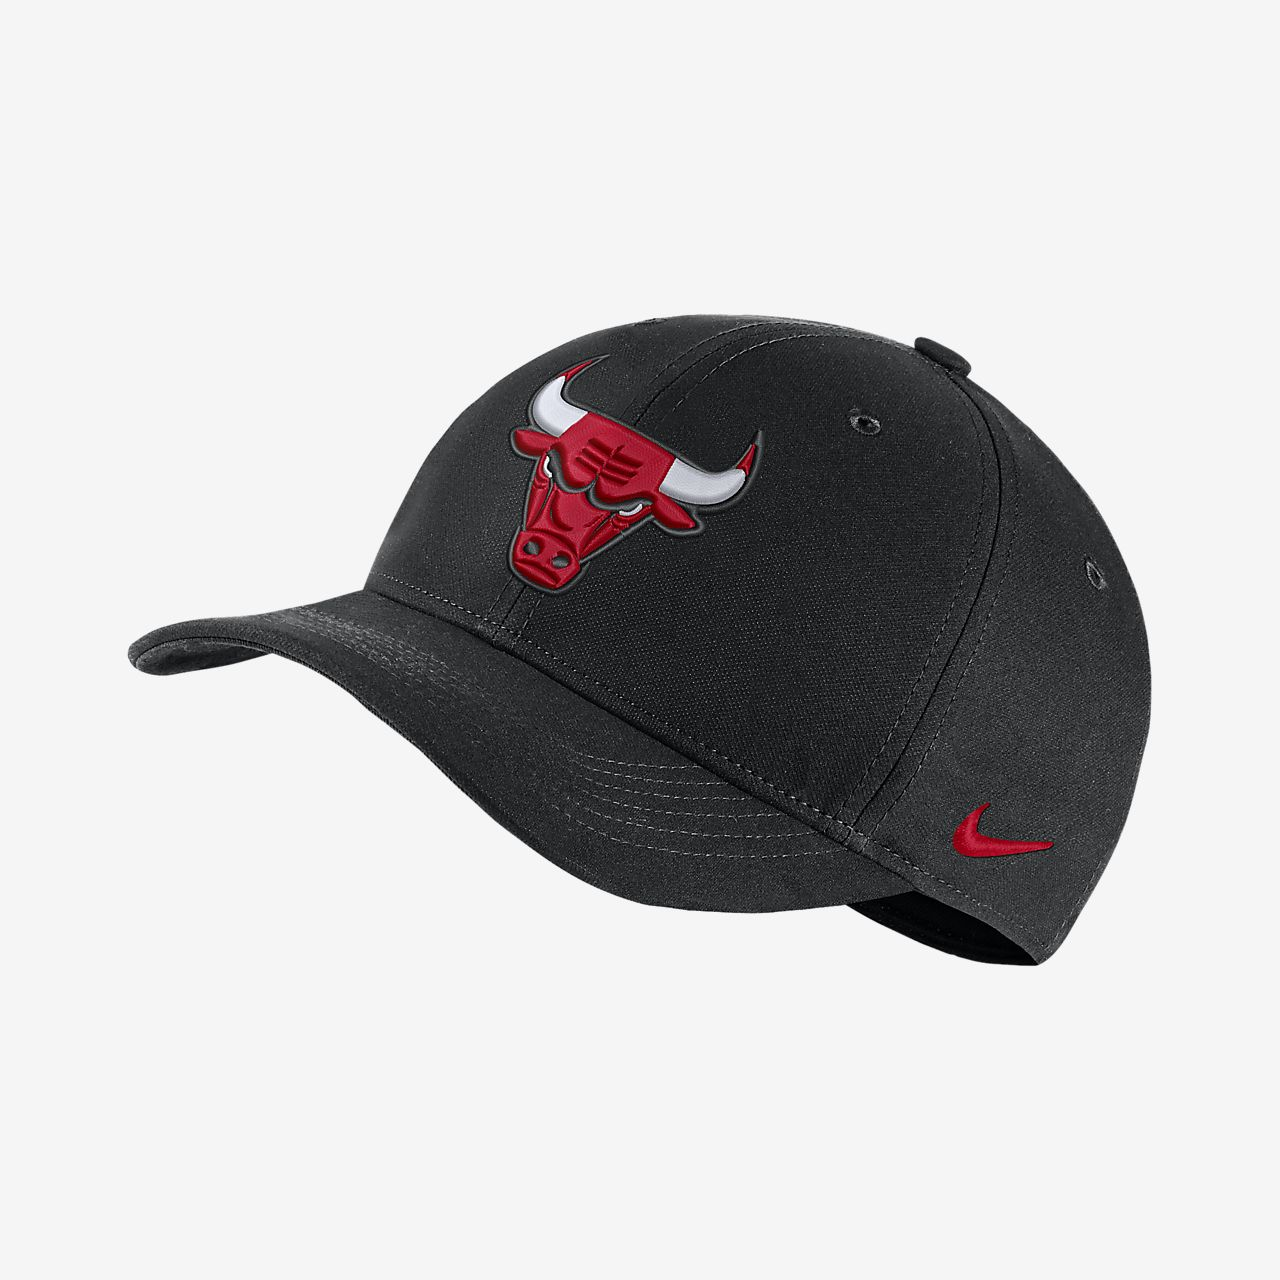 Boné NBA Chicago Bulls City Edition Nike AeroBill Classic99